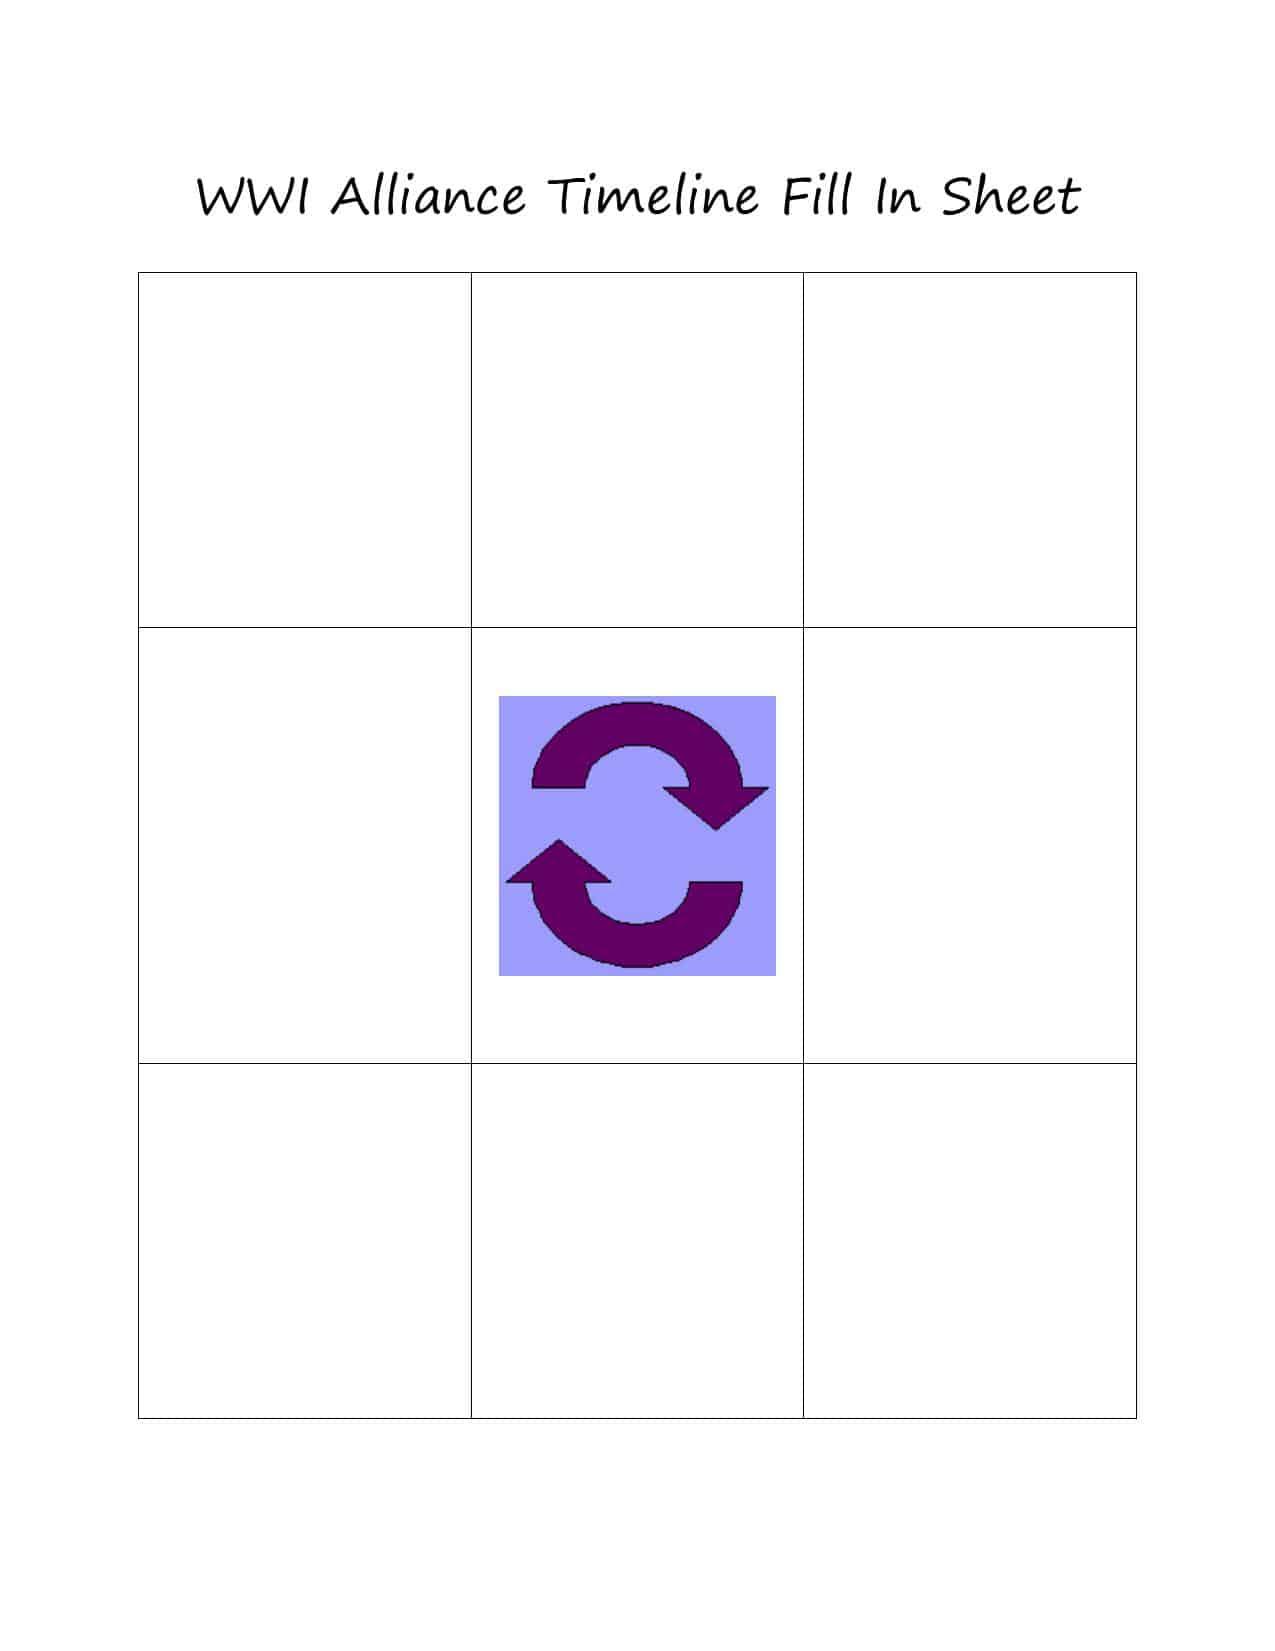 Wwi Alliance Timeline Igcse Fill In Worksheet